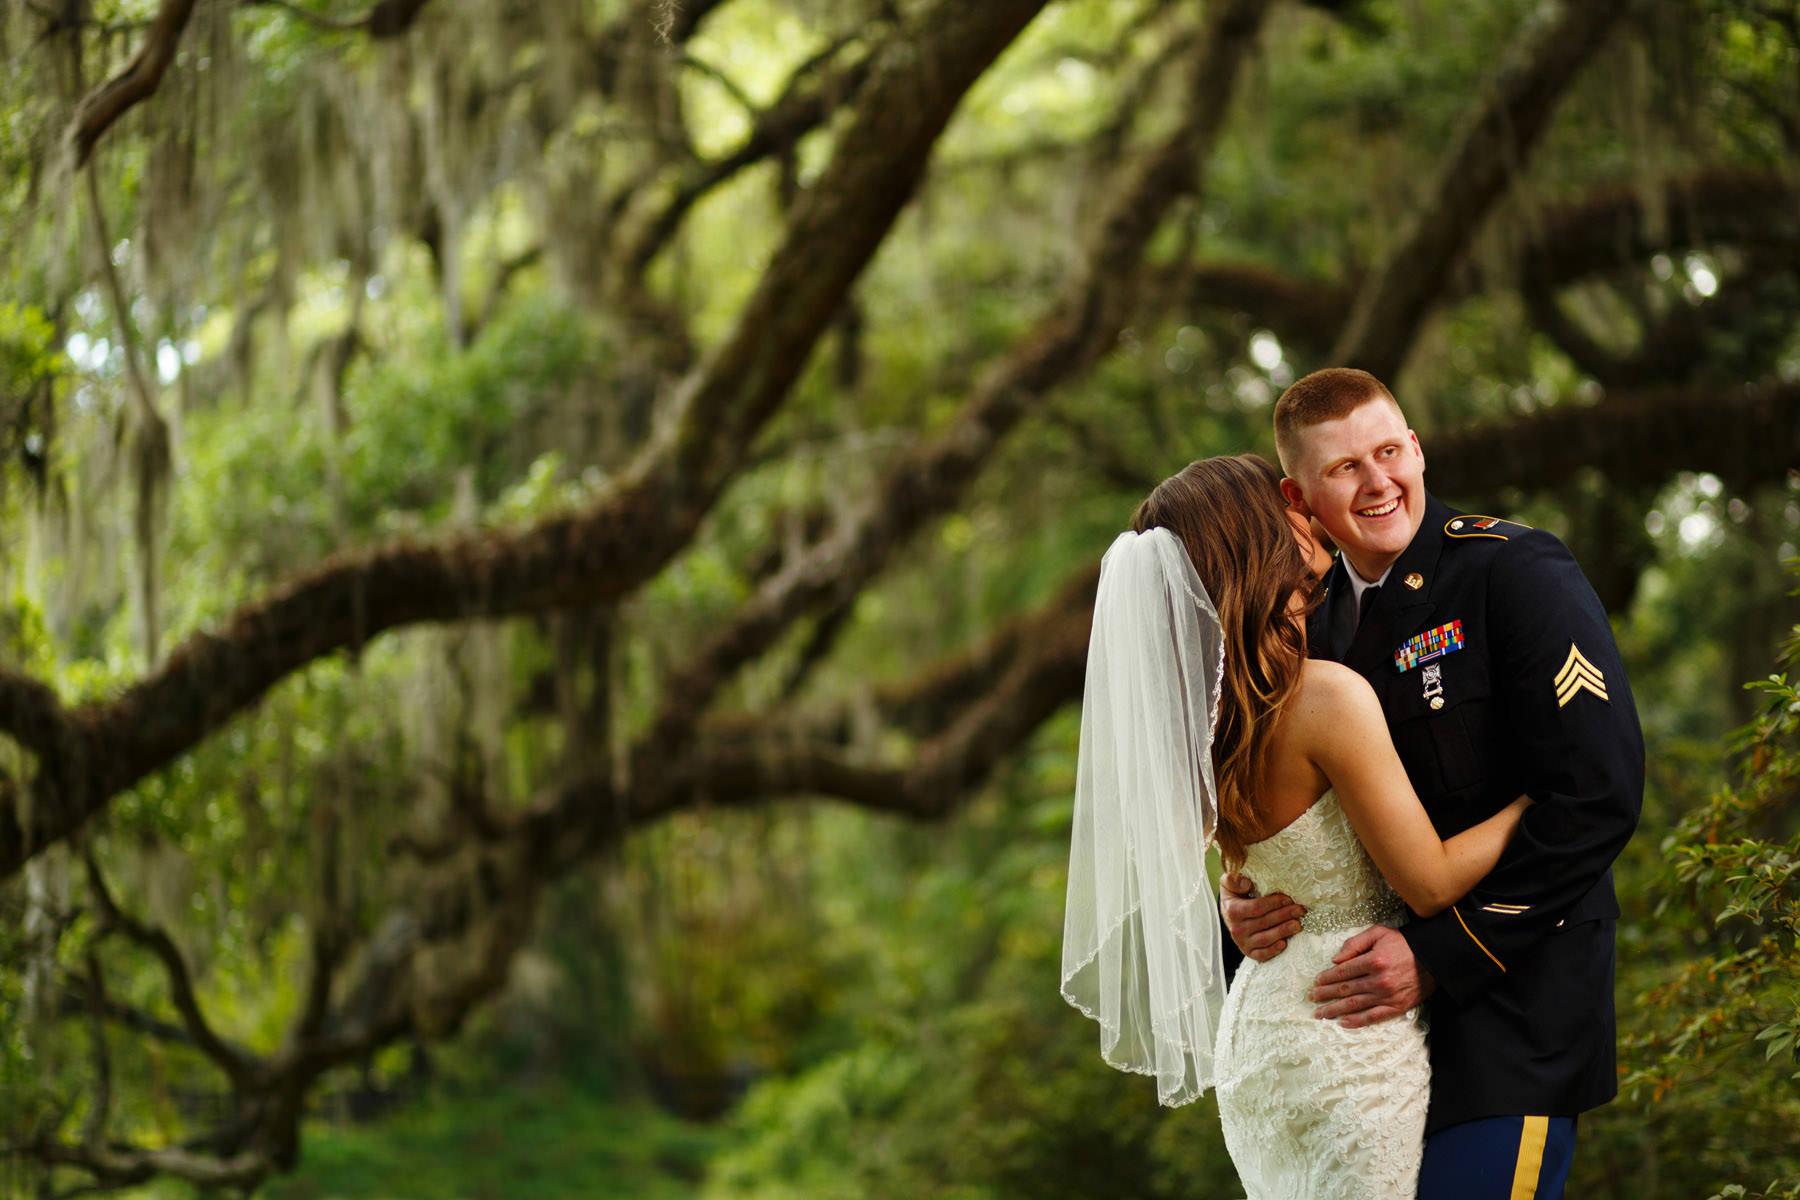 tc_tahy_wedding_113as